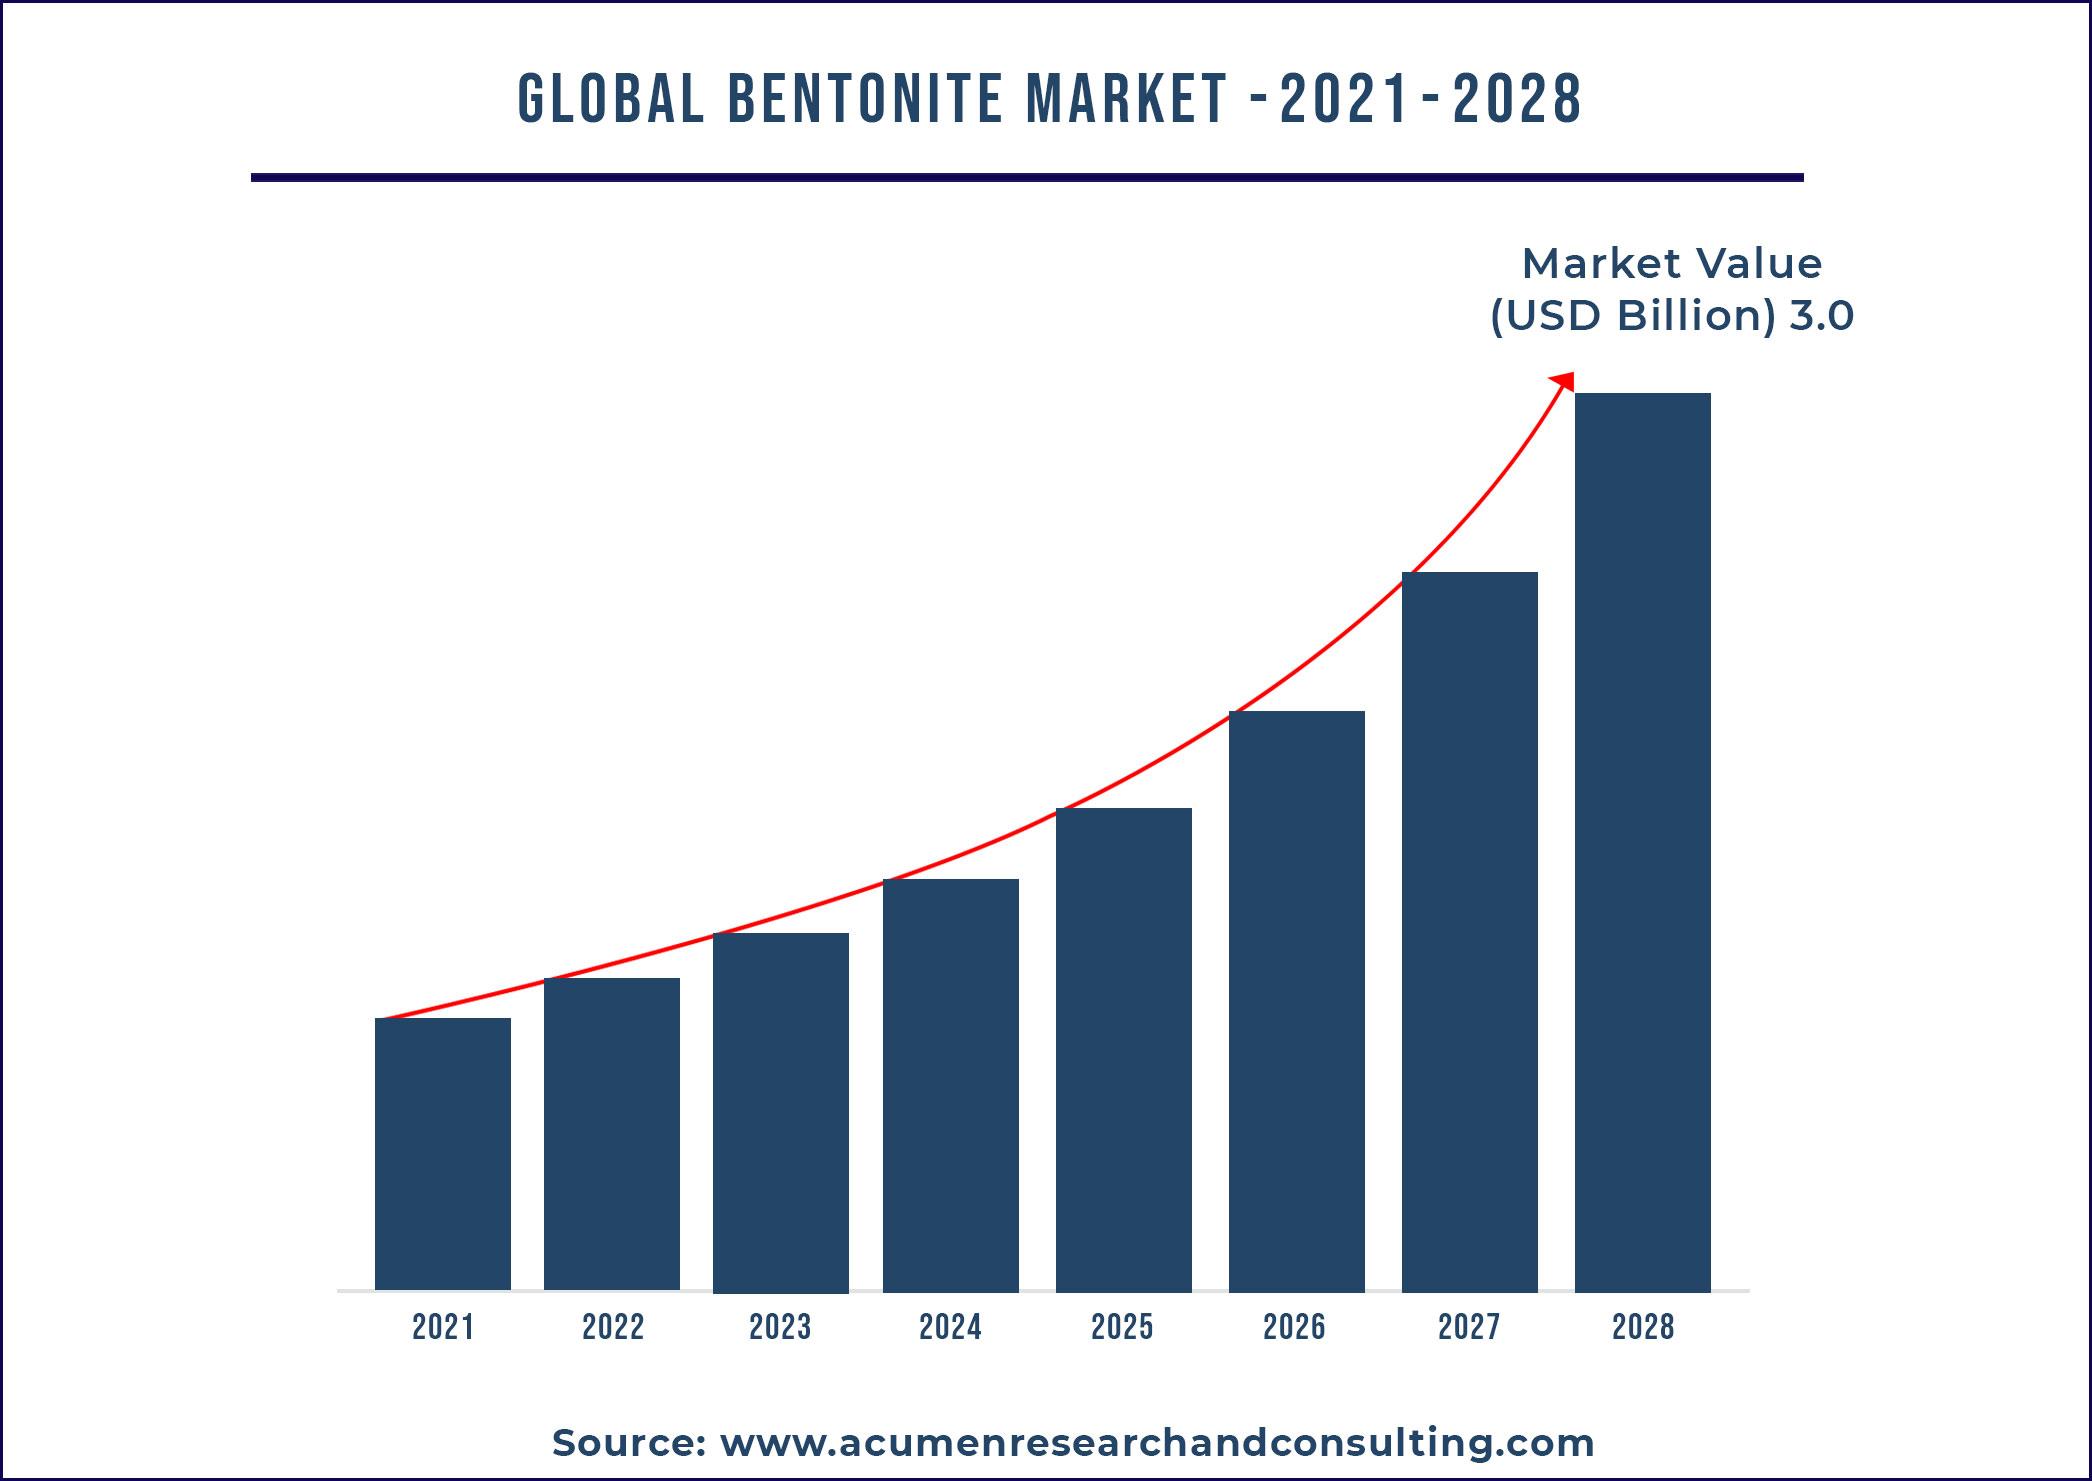 Bentonite Market